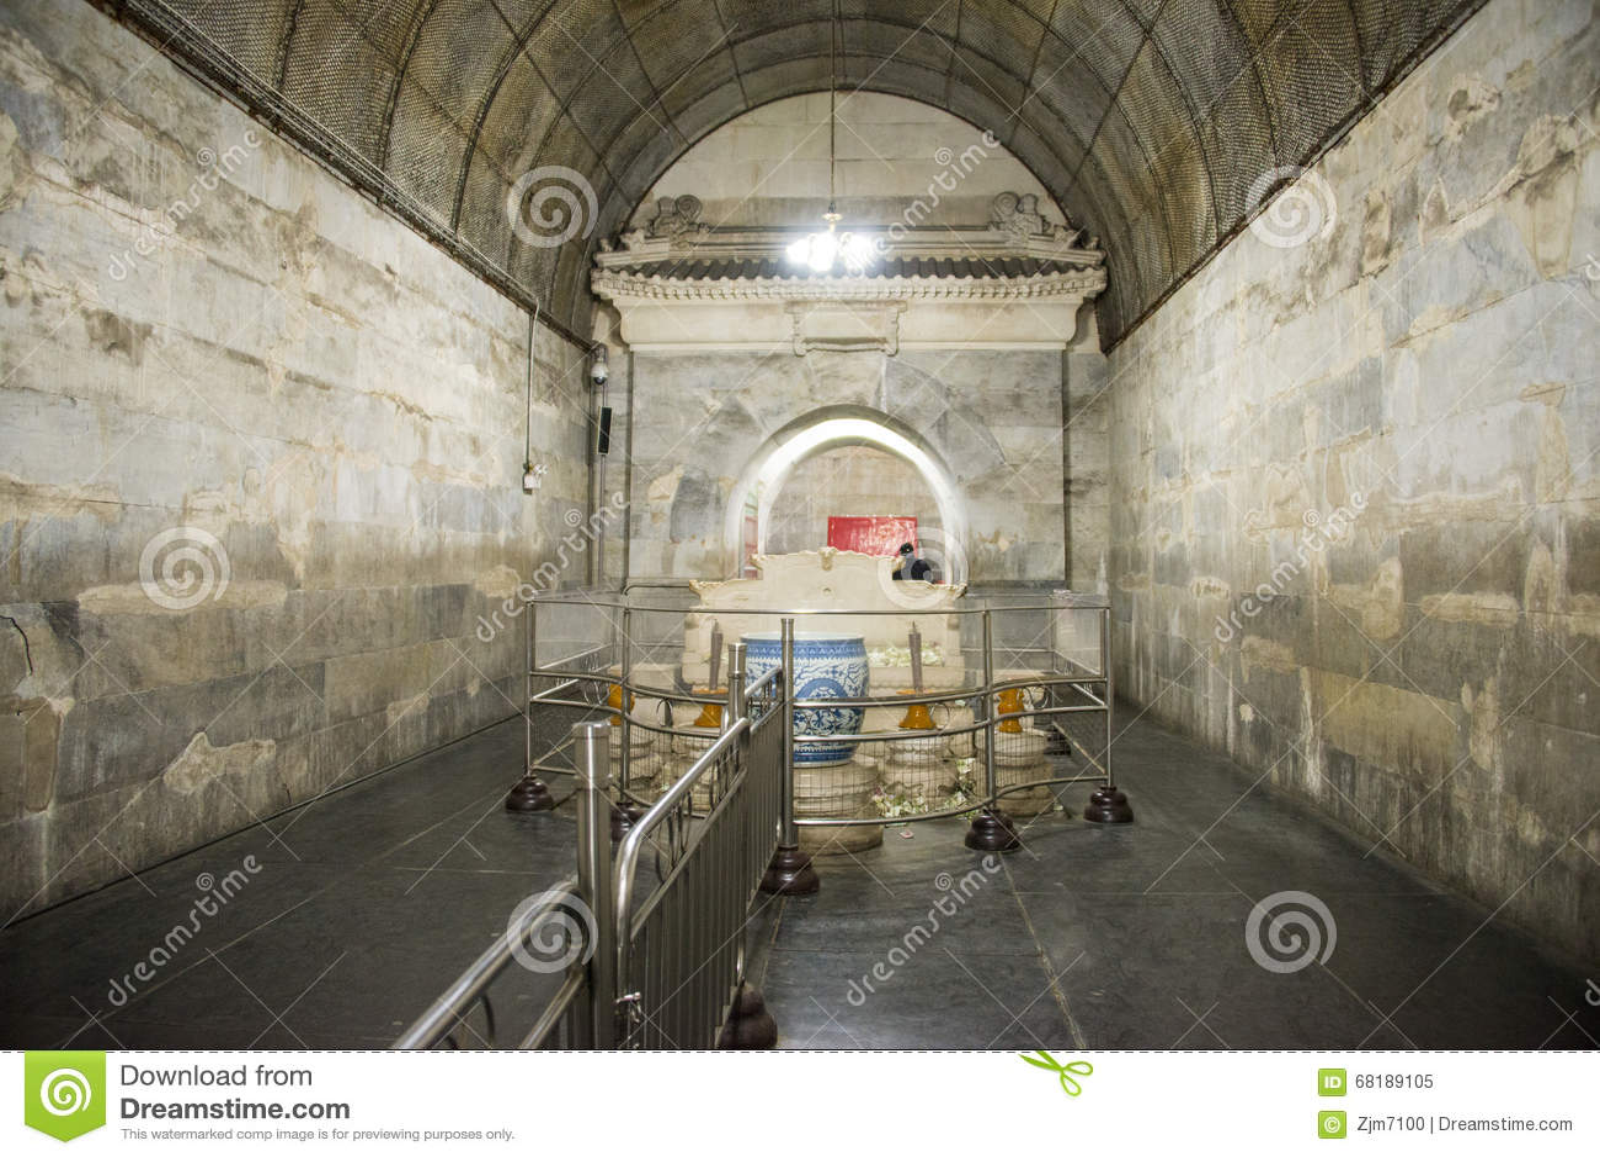 Azië Chinees, Peking, het graf Œunderground palaceï ¼ ŒUnderground van Ming Dynasty Tombsï ¼